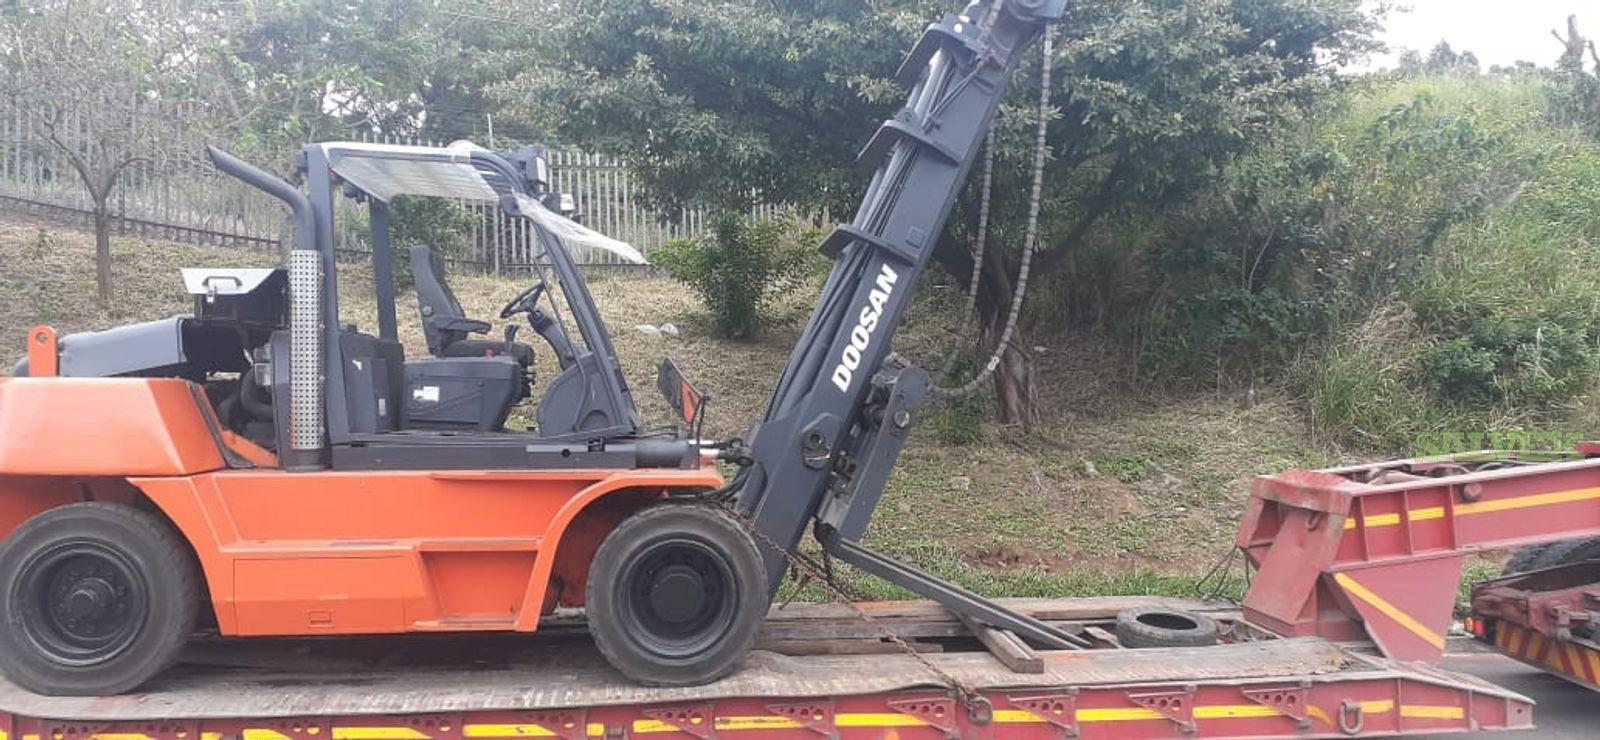 Doosan D130S-5 13-Ton Diesel Forklift 2012